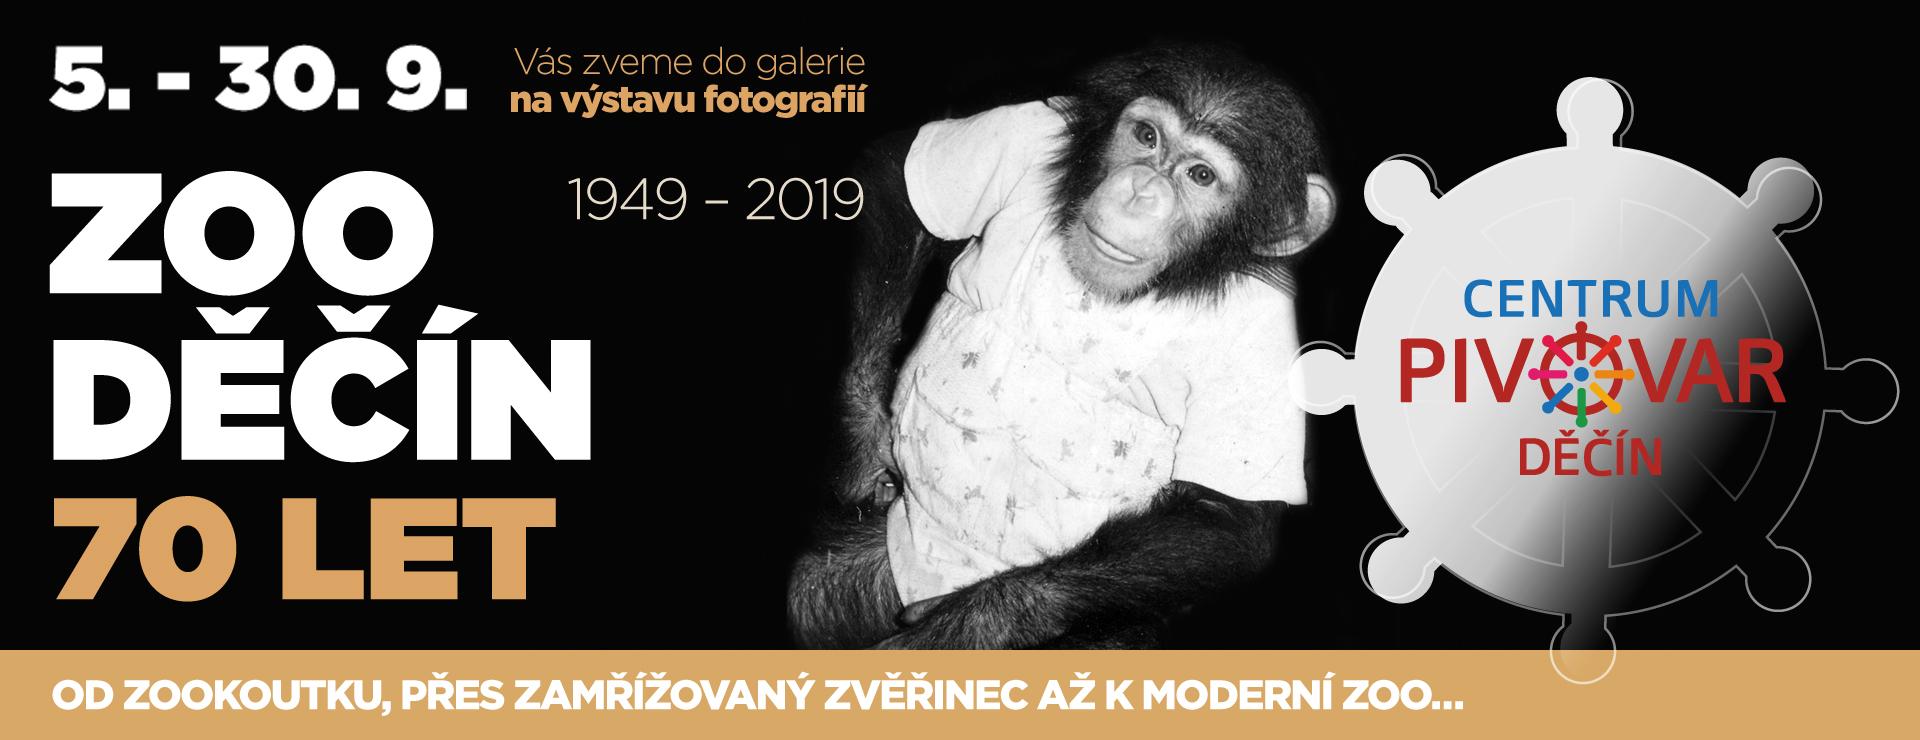 banner-1920-x-740-zoo.jpg